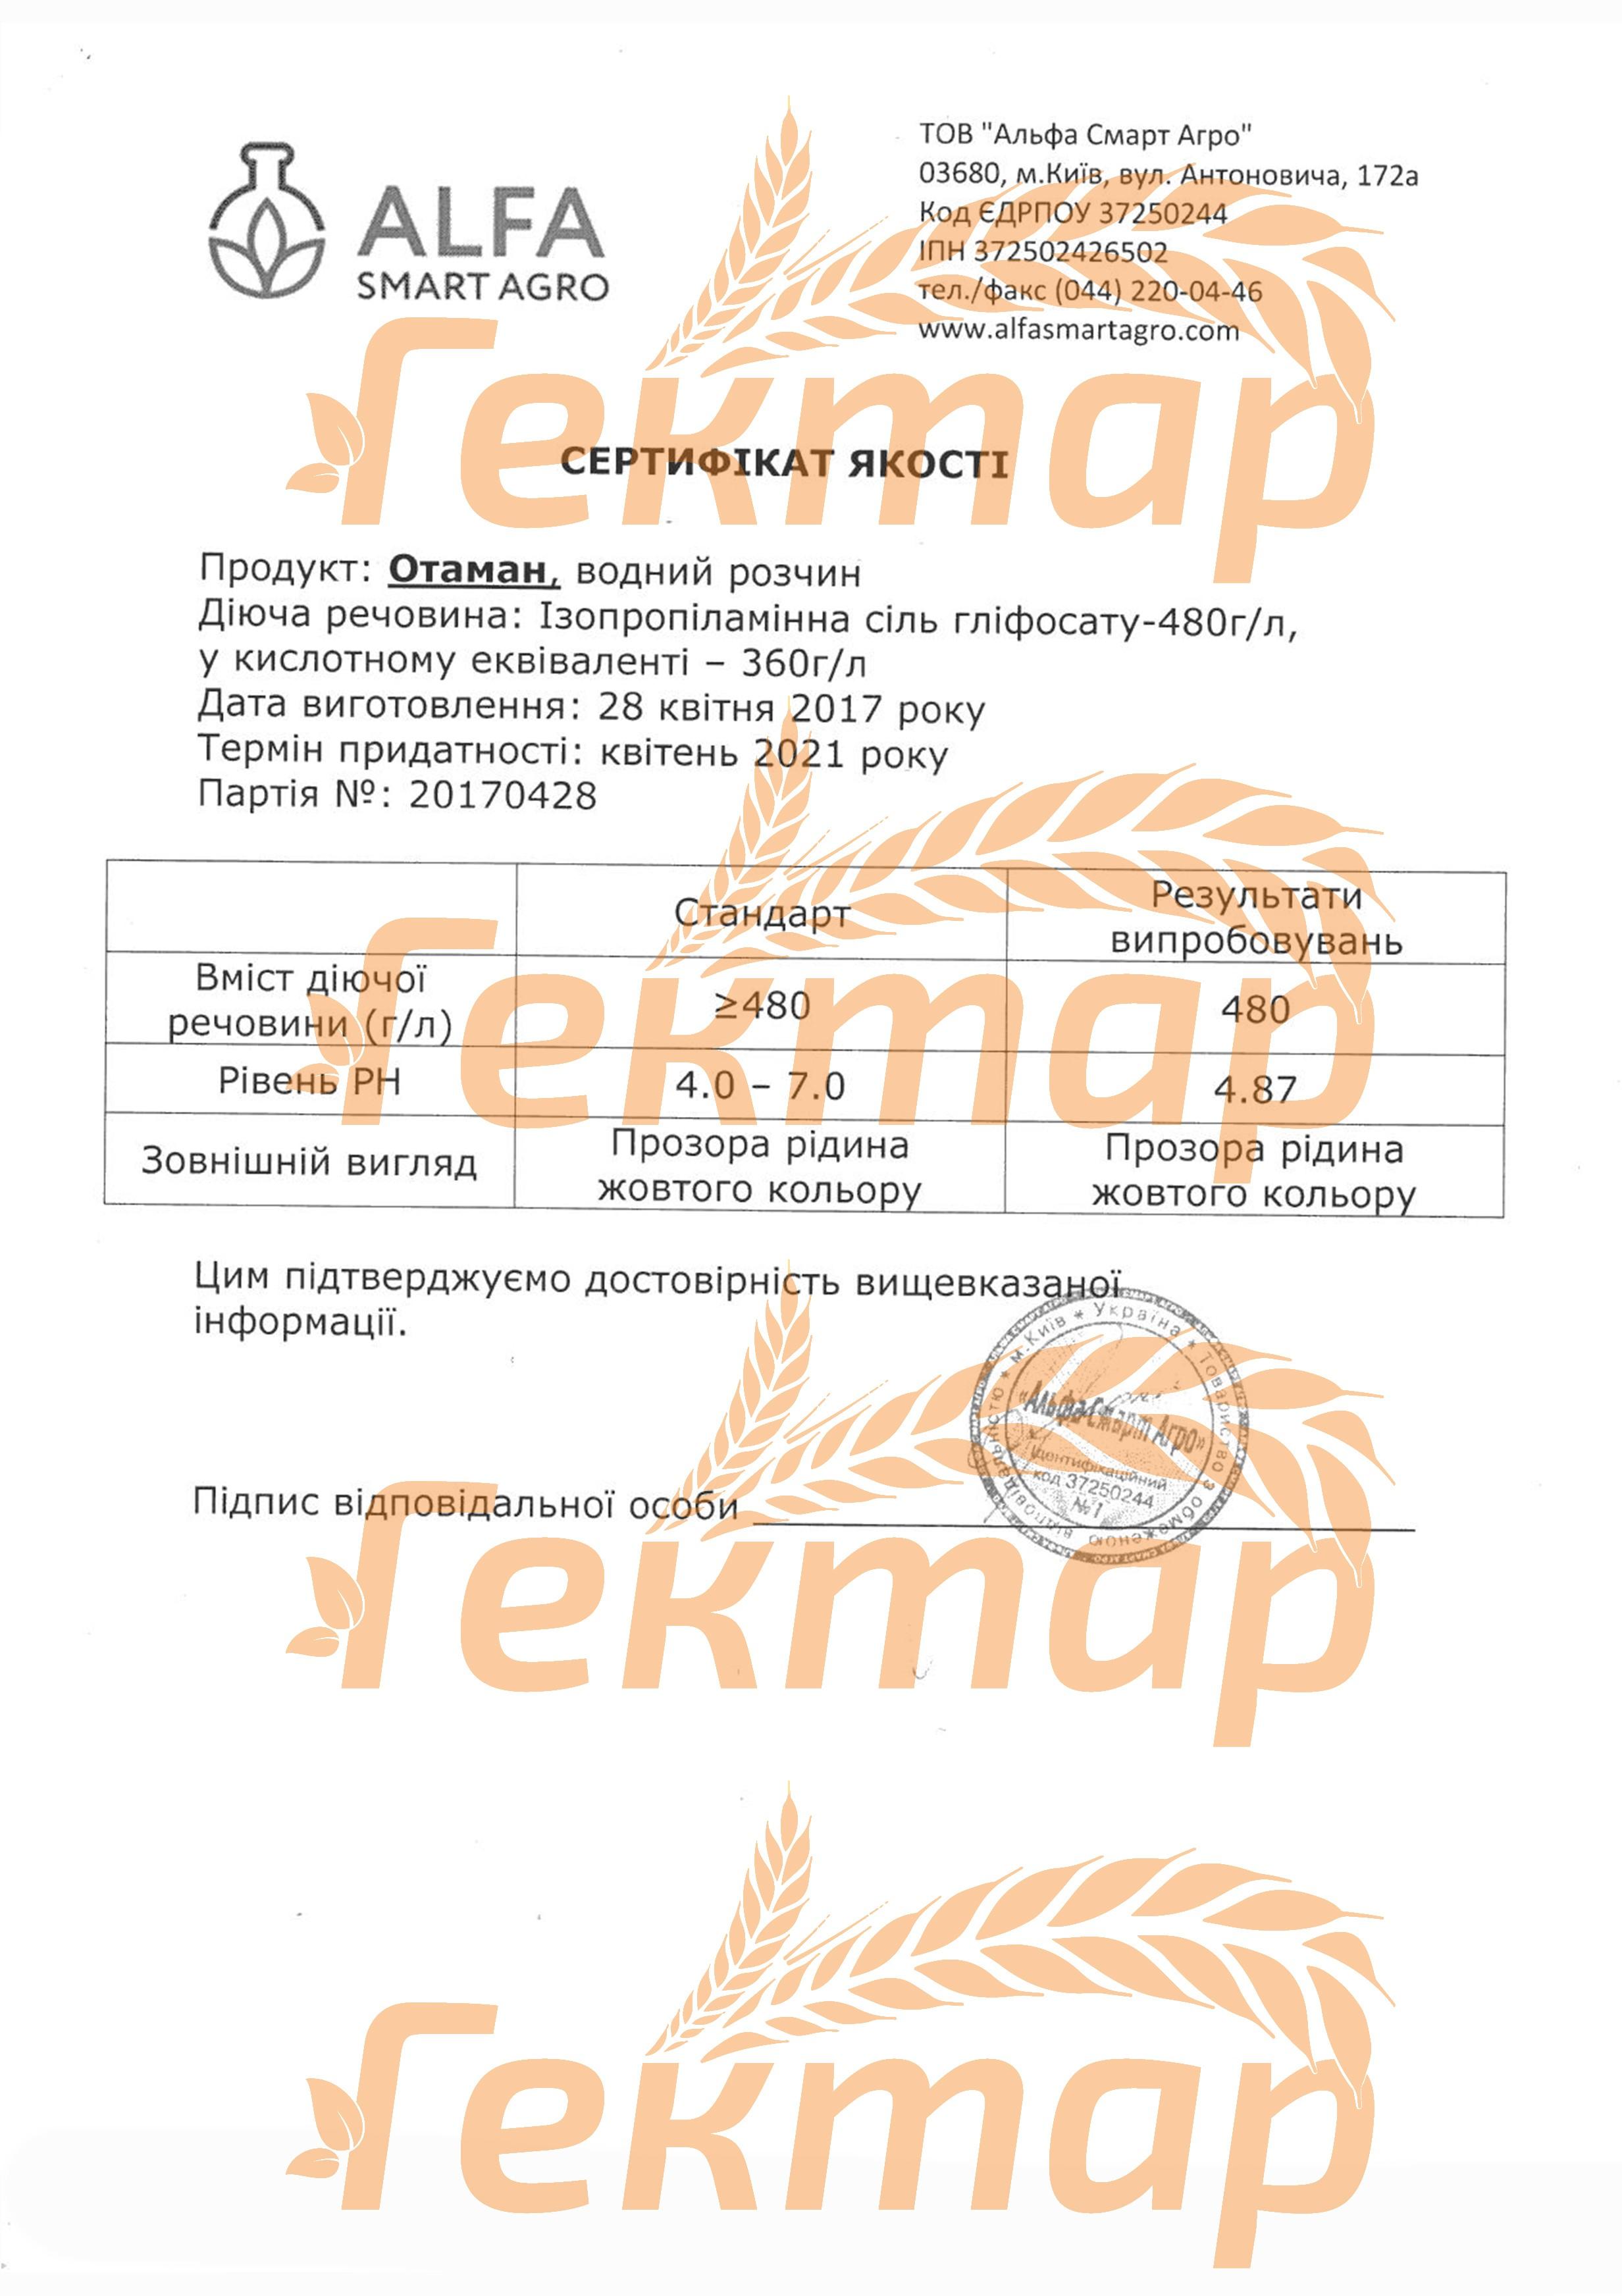 https://hectare.ua/upload/5aafab891a24c.jpg